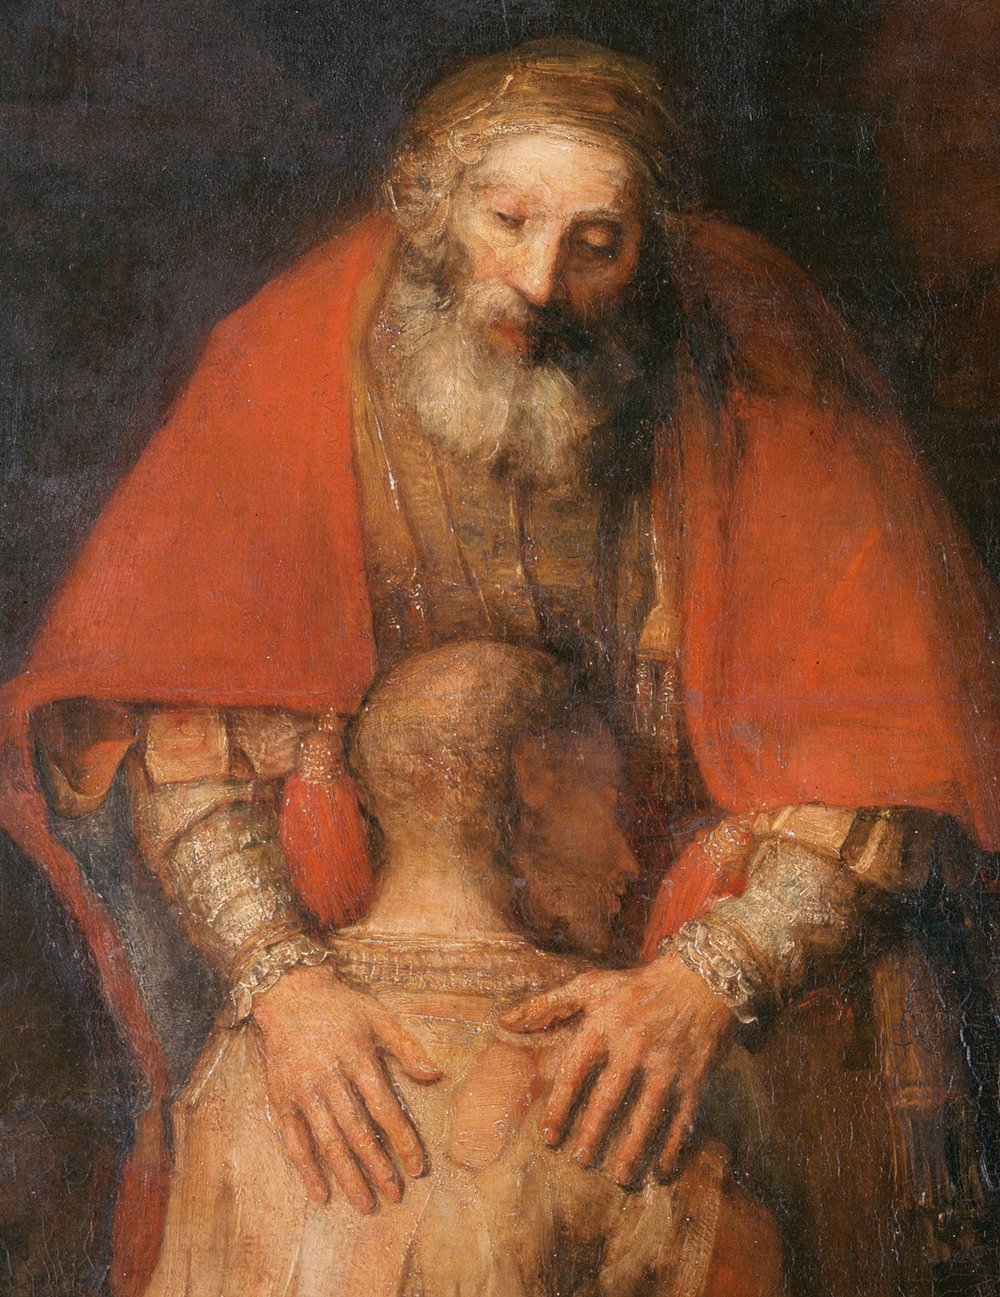 Rembrandt_Harmensz._van_Rijn_-_The_Return_of_the_Prodigal_Son_-_Detail_Father_Son.jpg